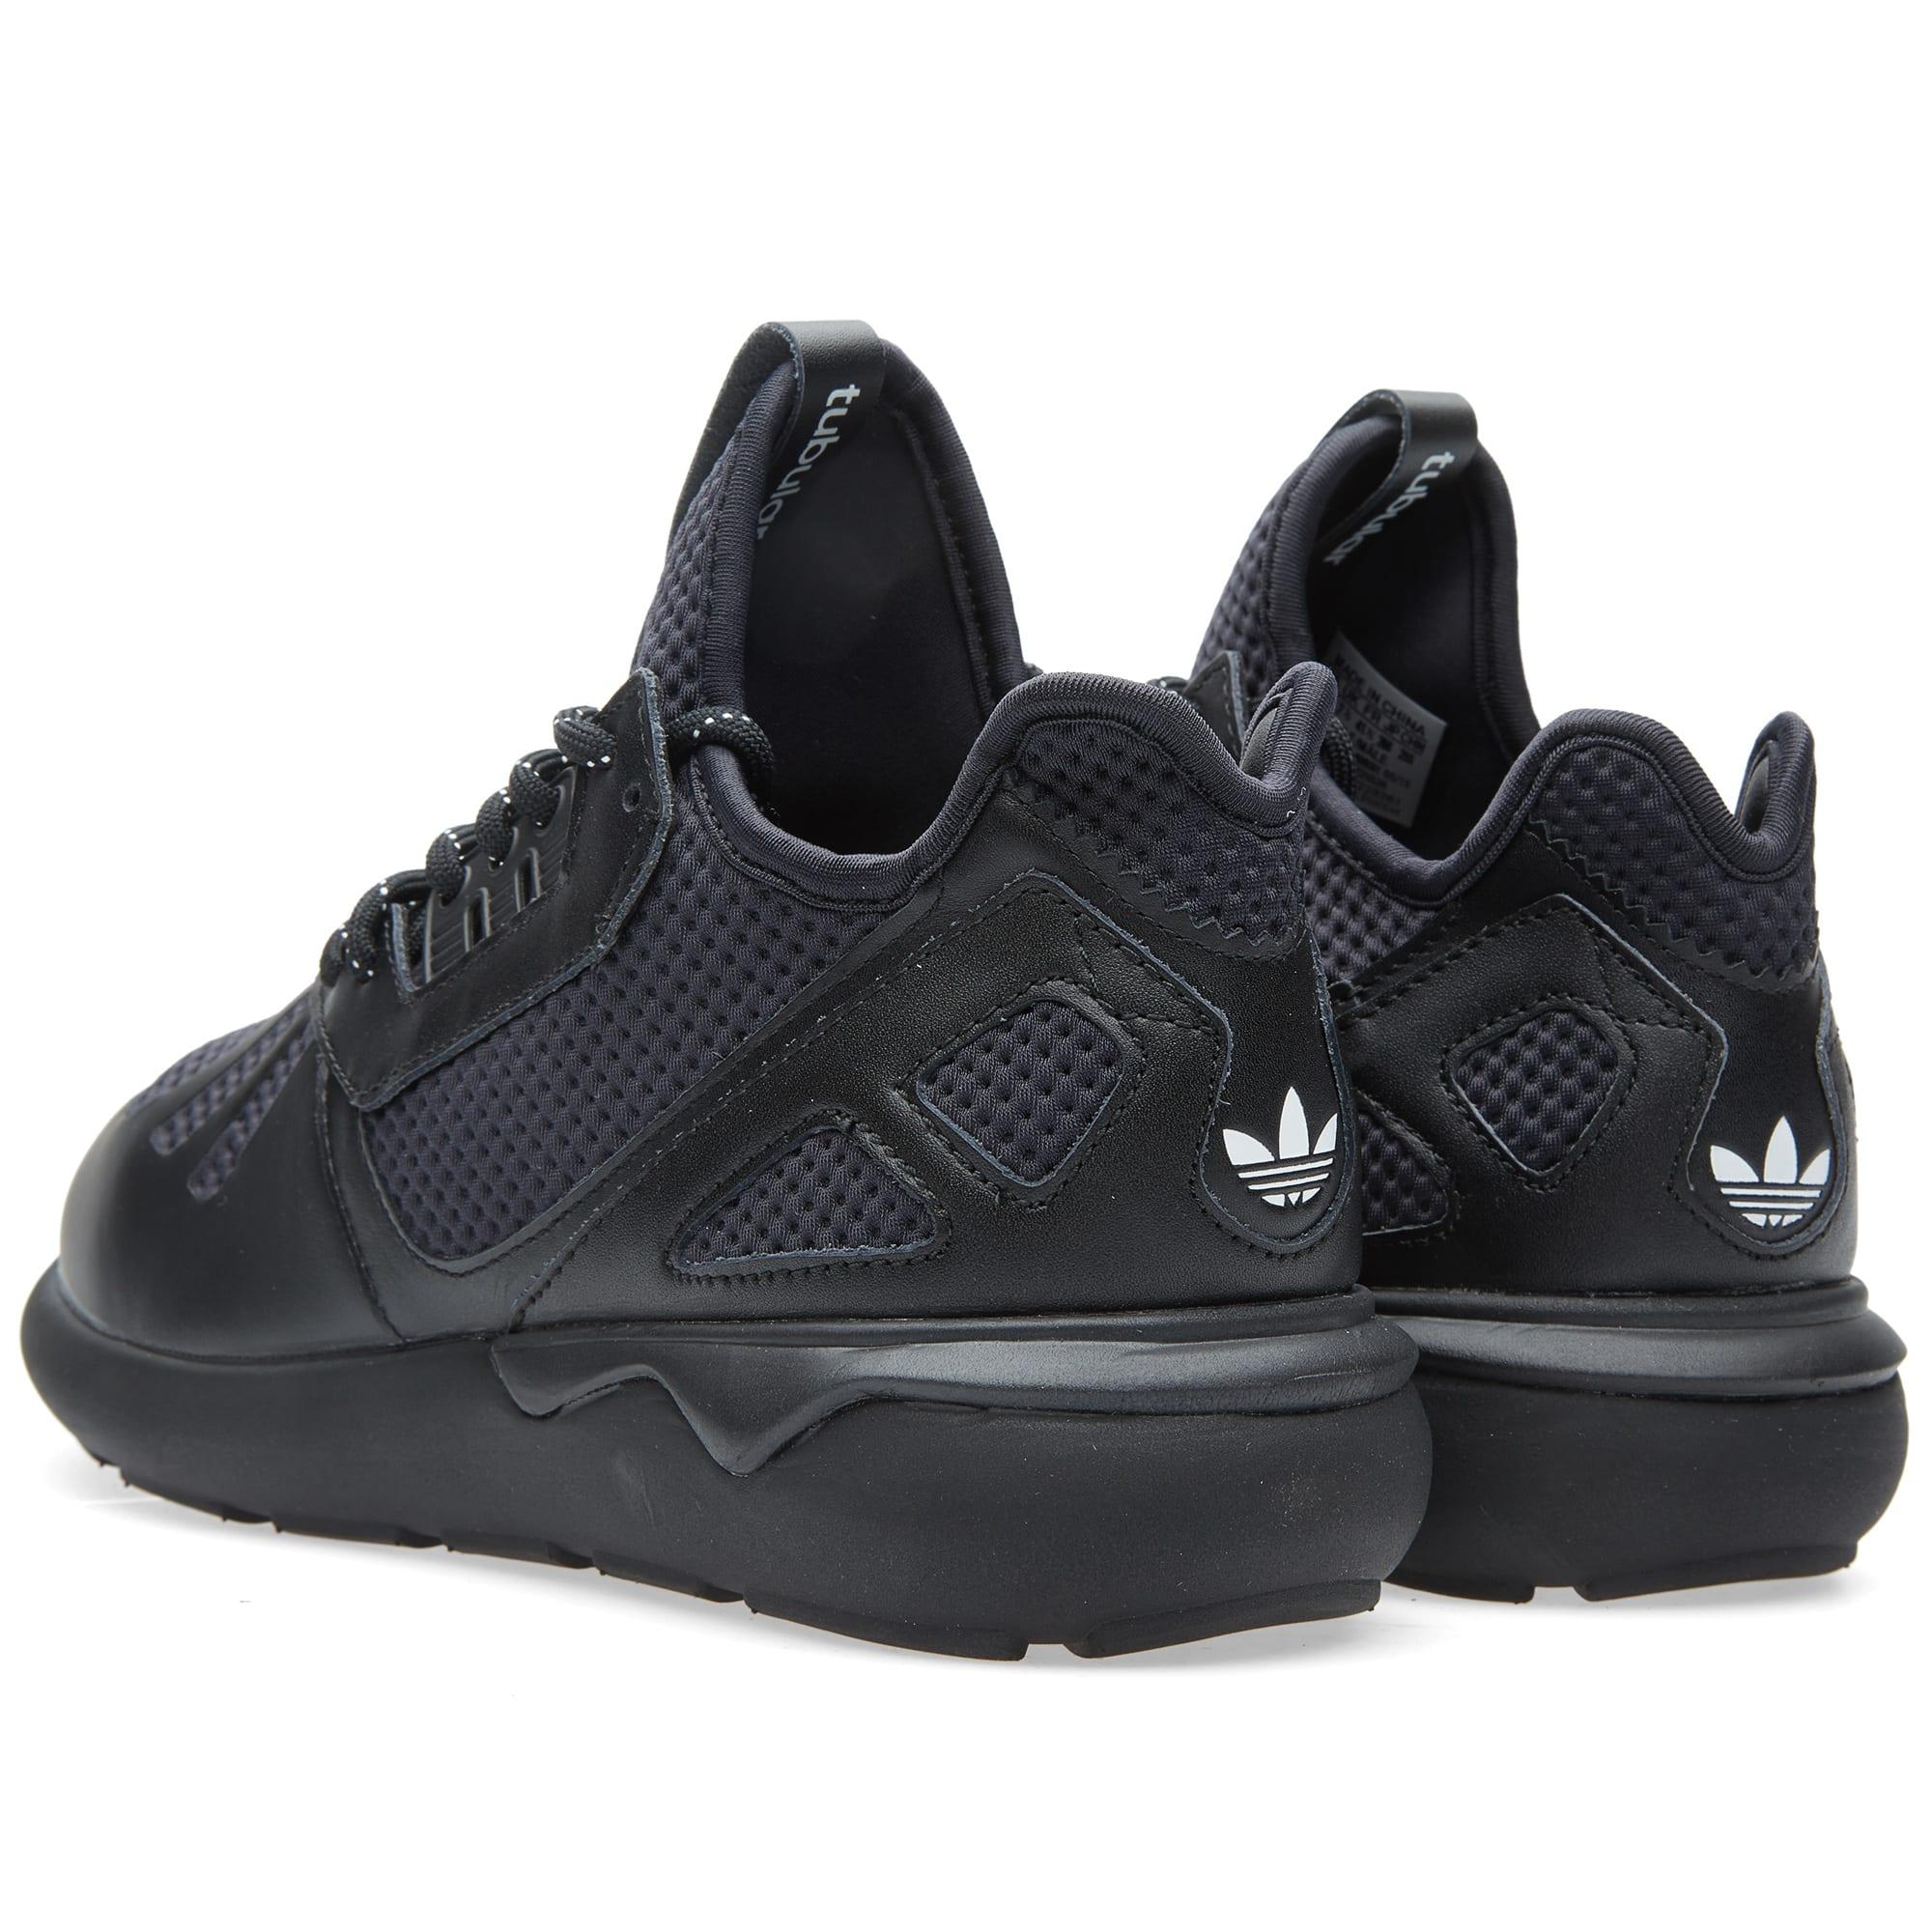 Confiar Amabilidad Adolescencia  Adidas Tubular Runner Core Black, Carbon & White | END.